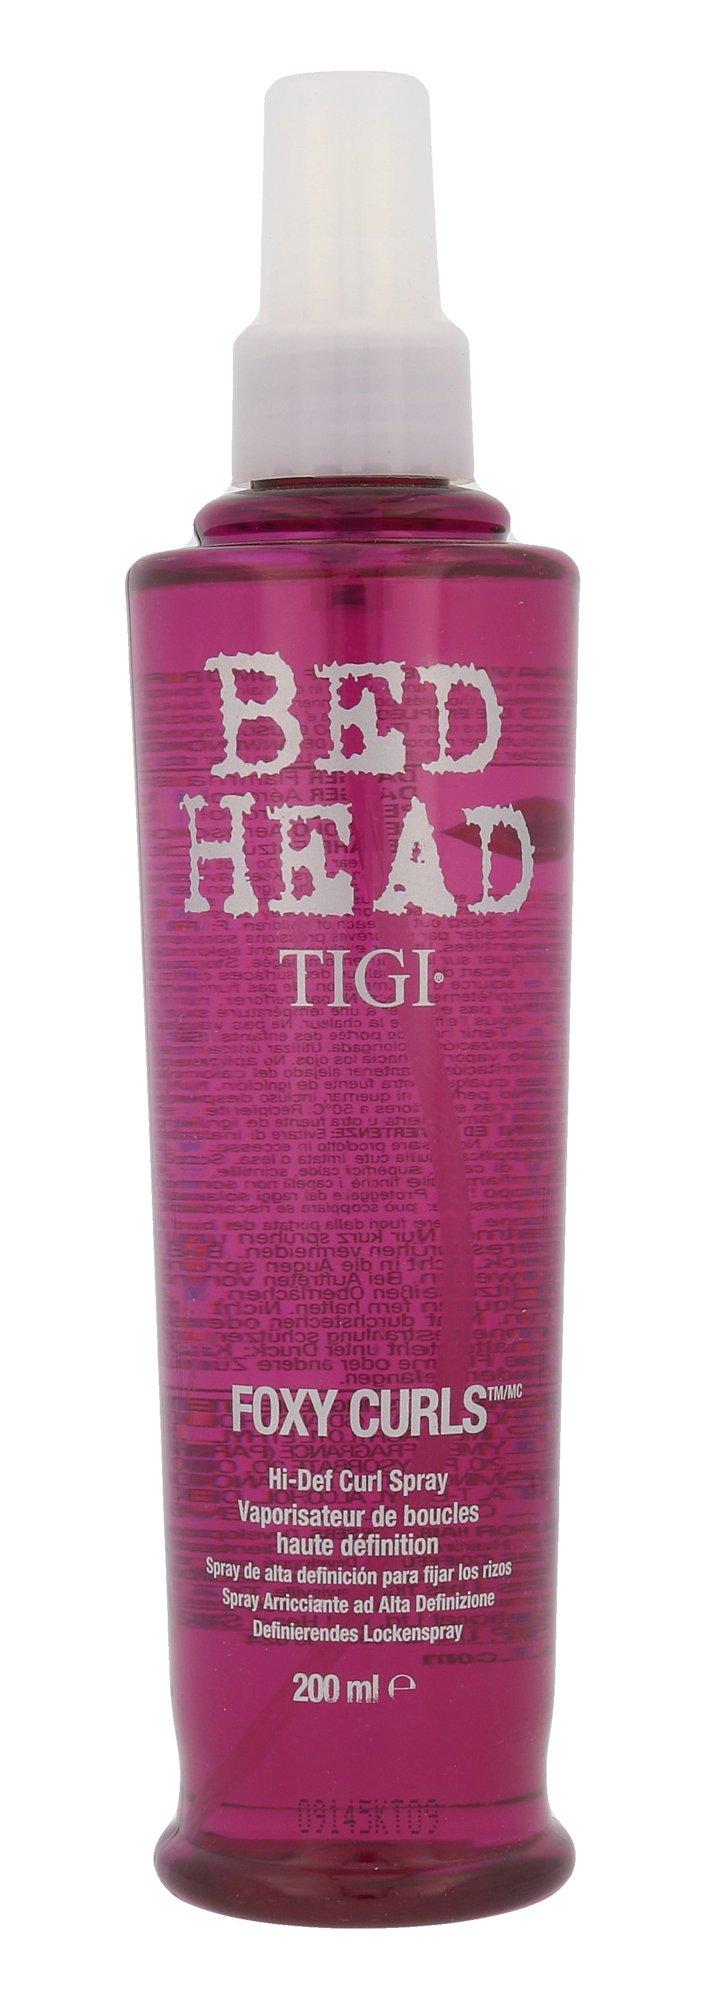 Tigi Bed Head Foxy Curls Cosmetic 200ml